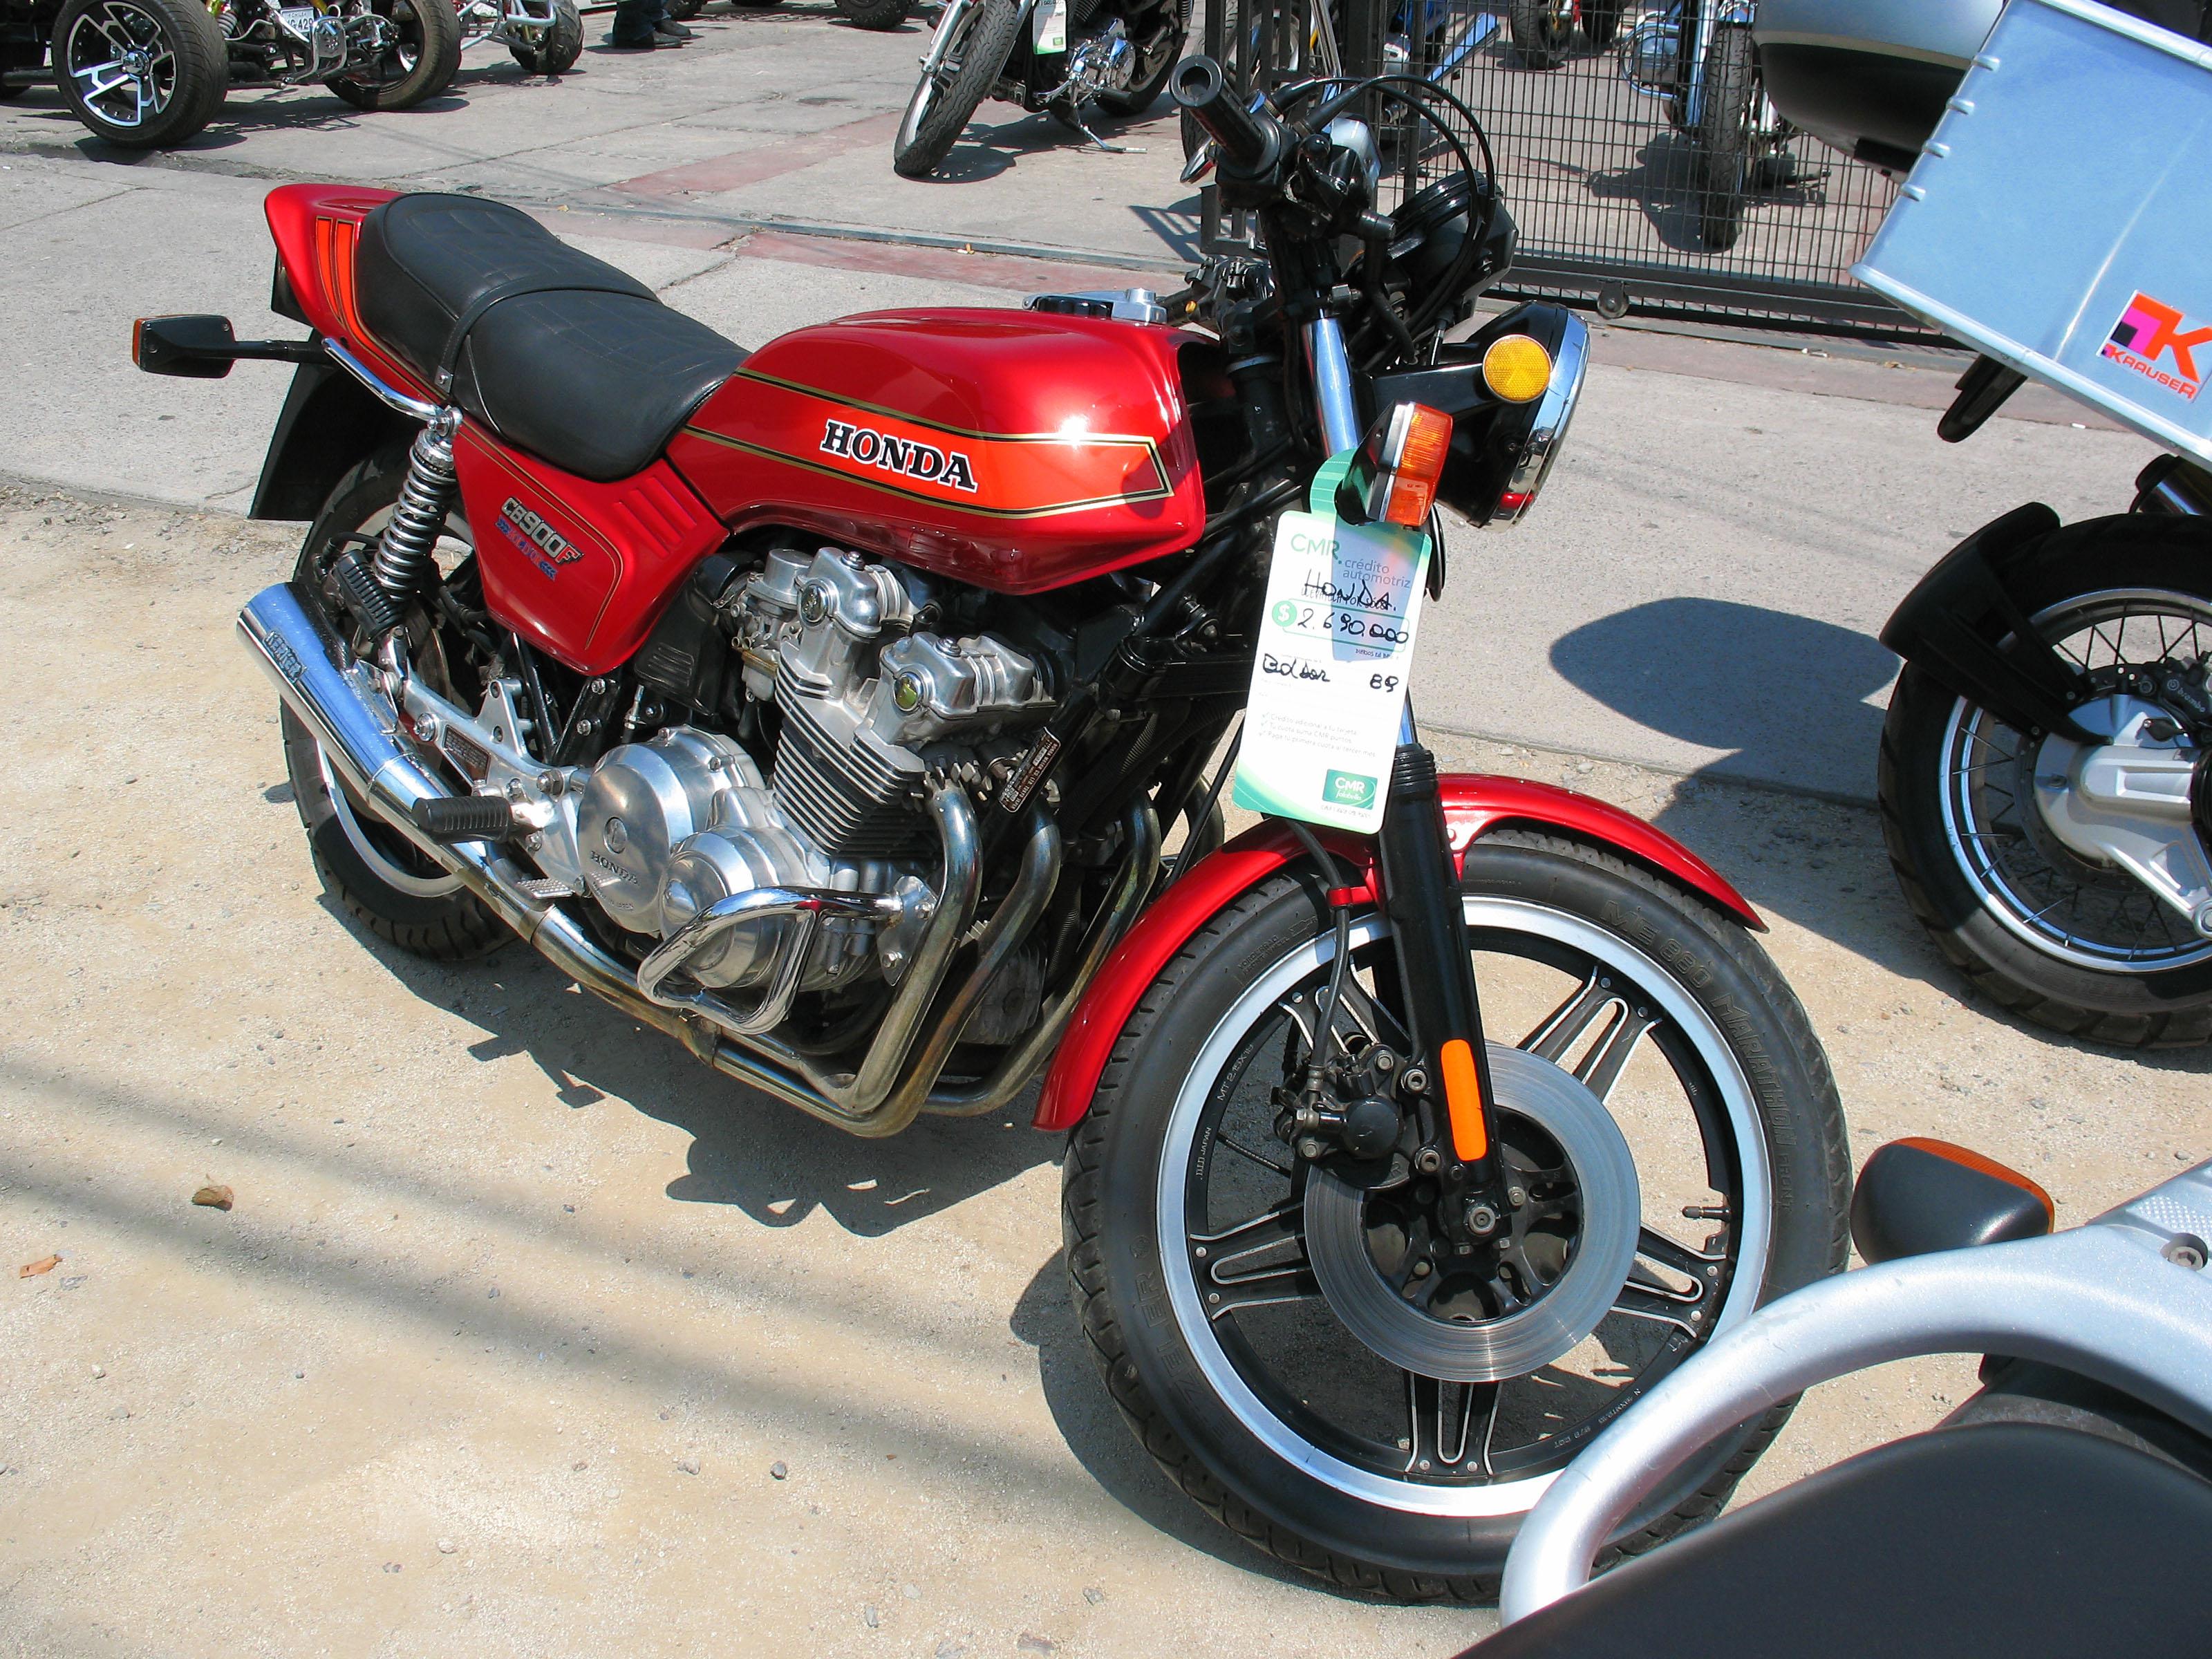 Build A Honda >> File:Honda CB 900F Boldor 1989 (12578546174).jpg ...